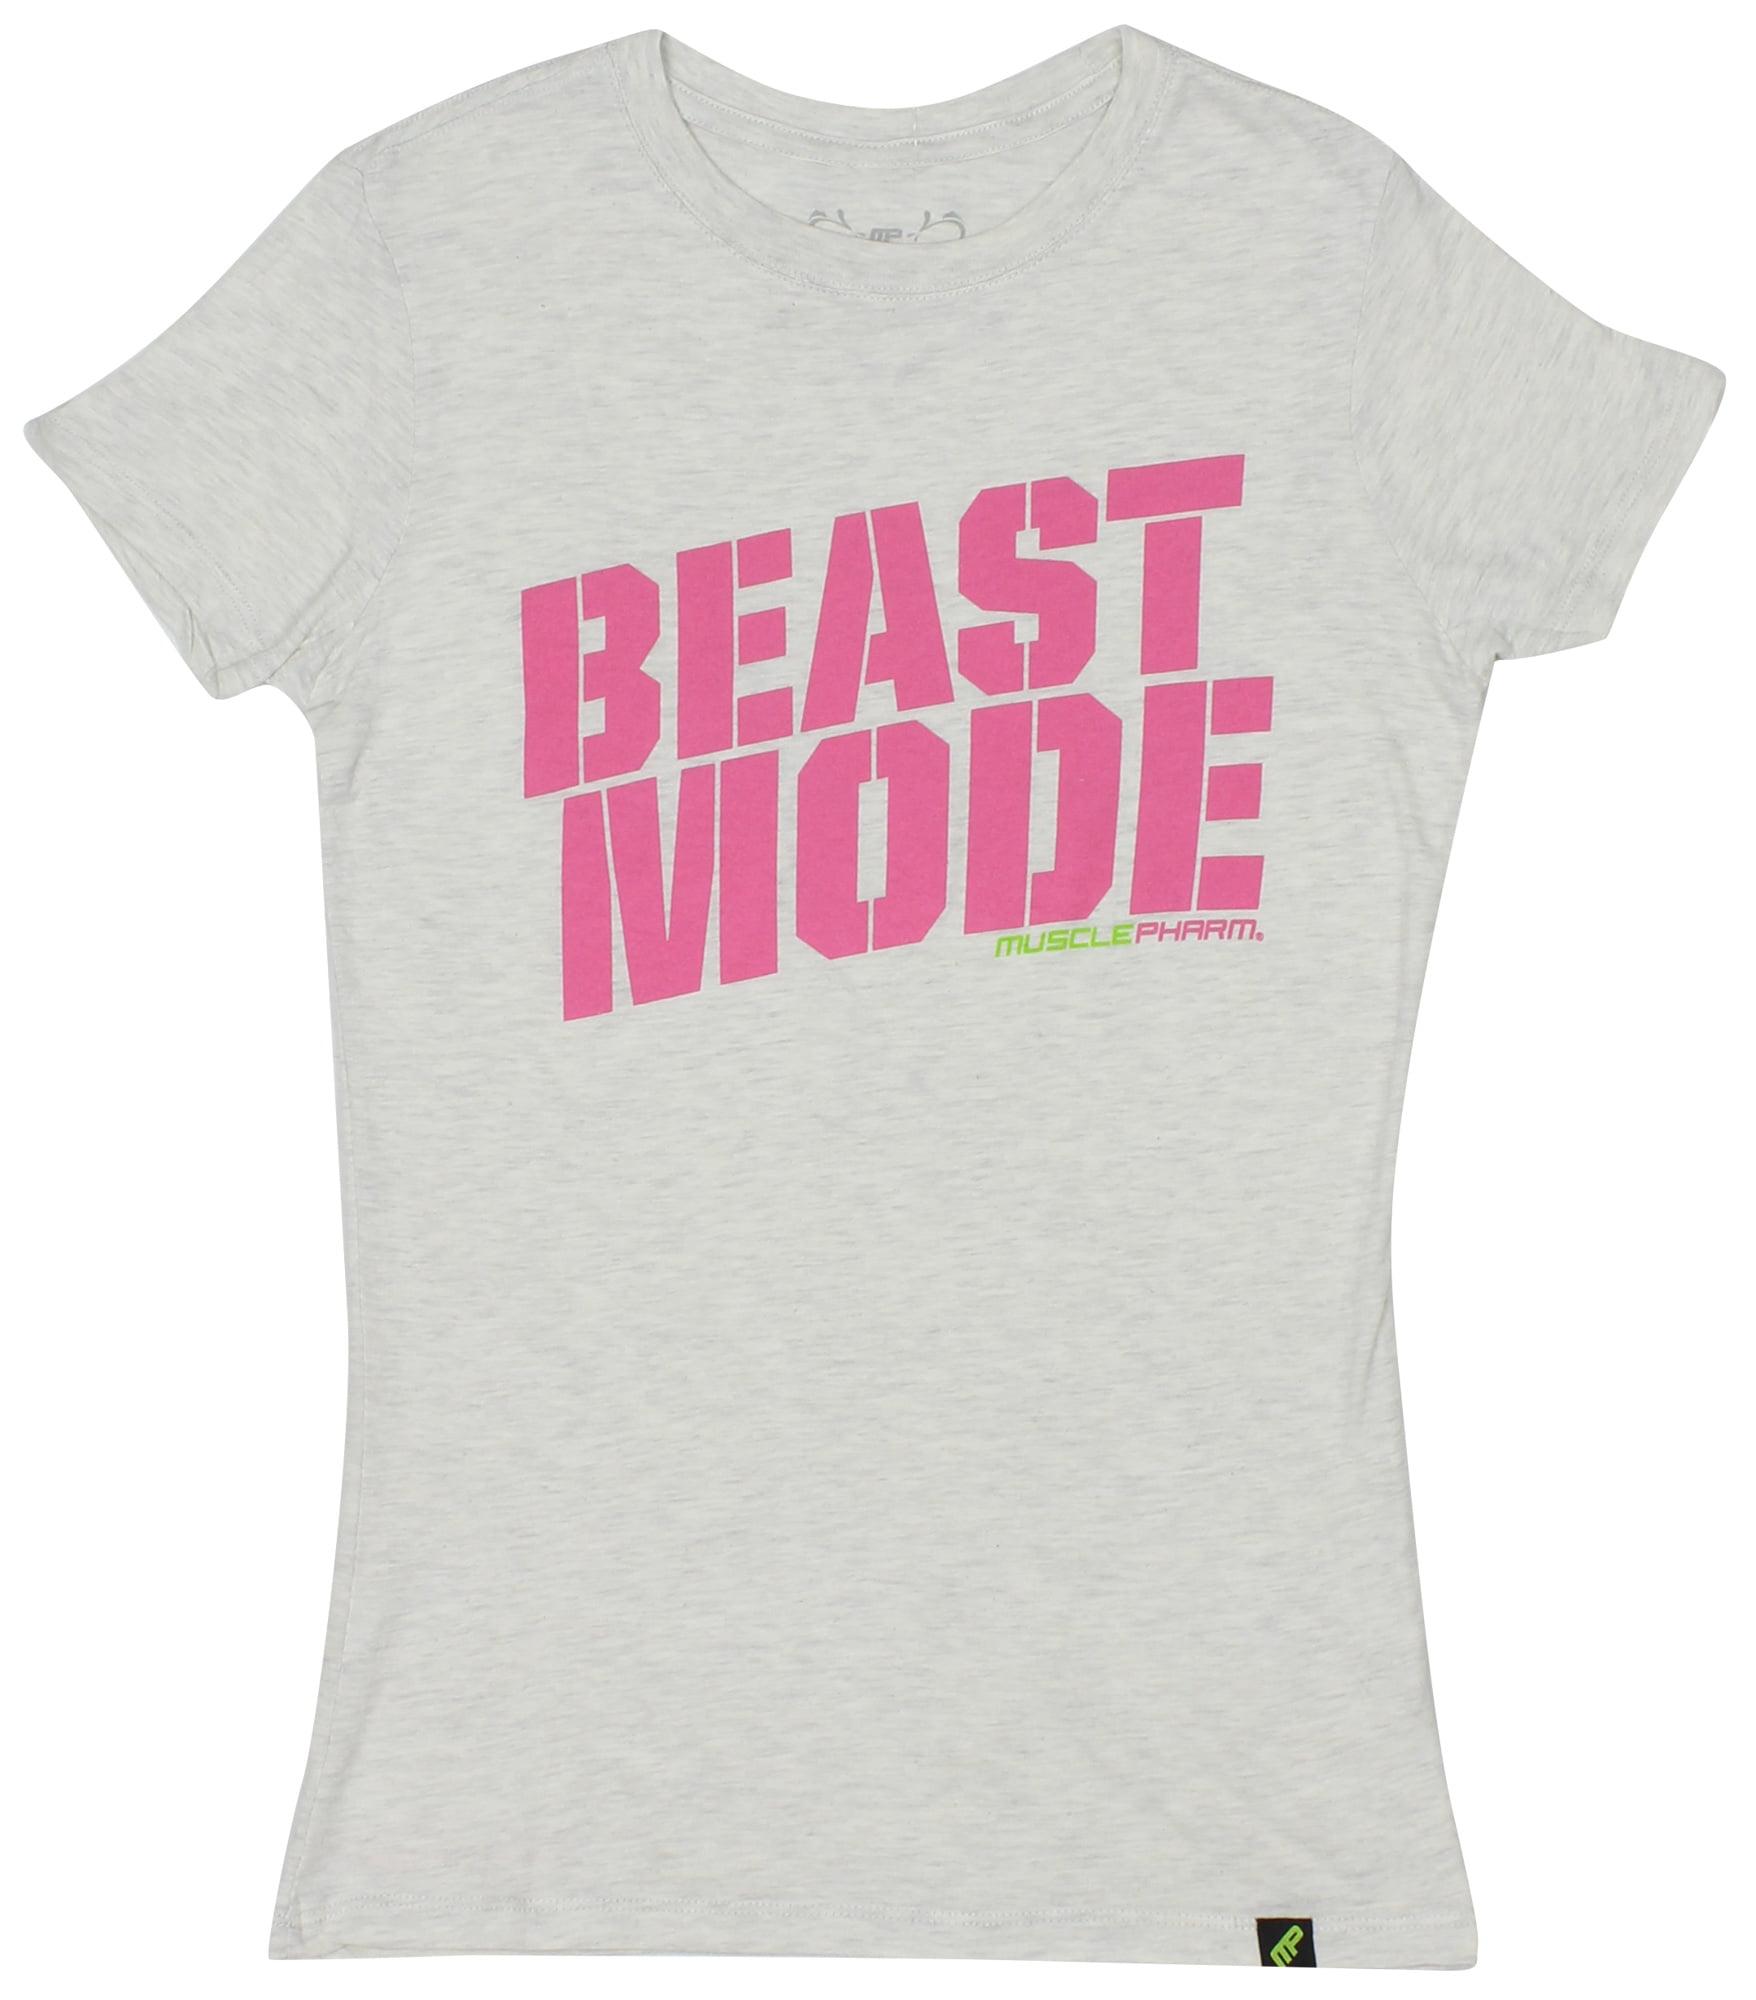 MusclePharm Womens Miss MusclePharm T-Shirt Pink